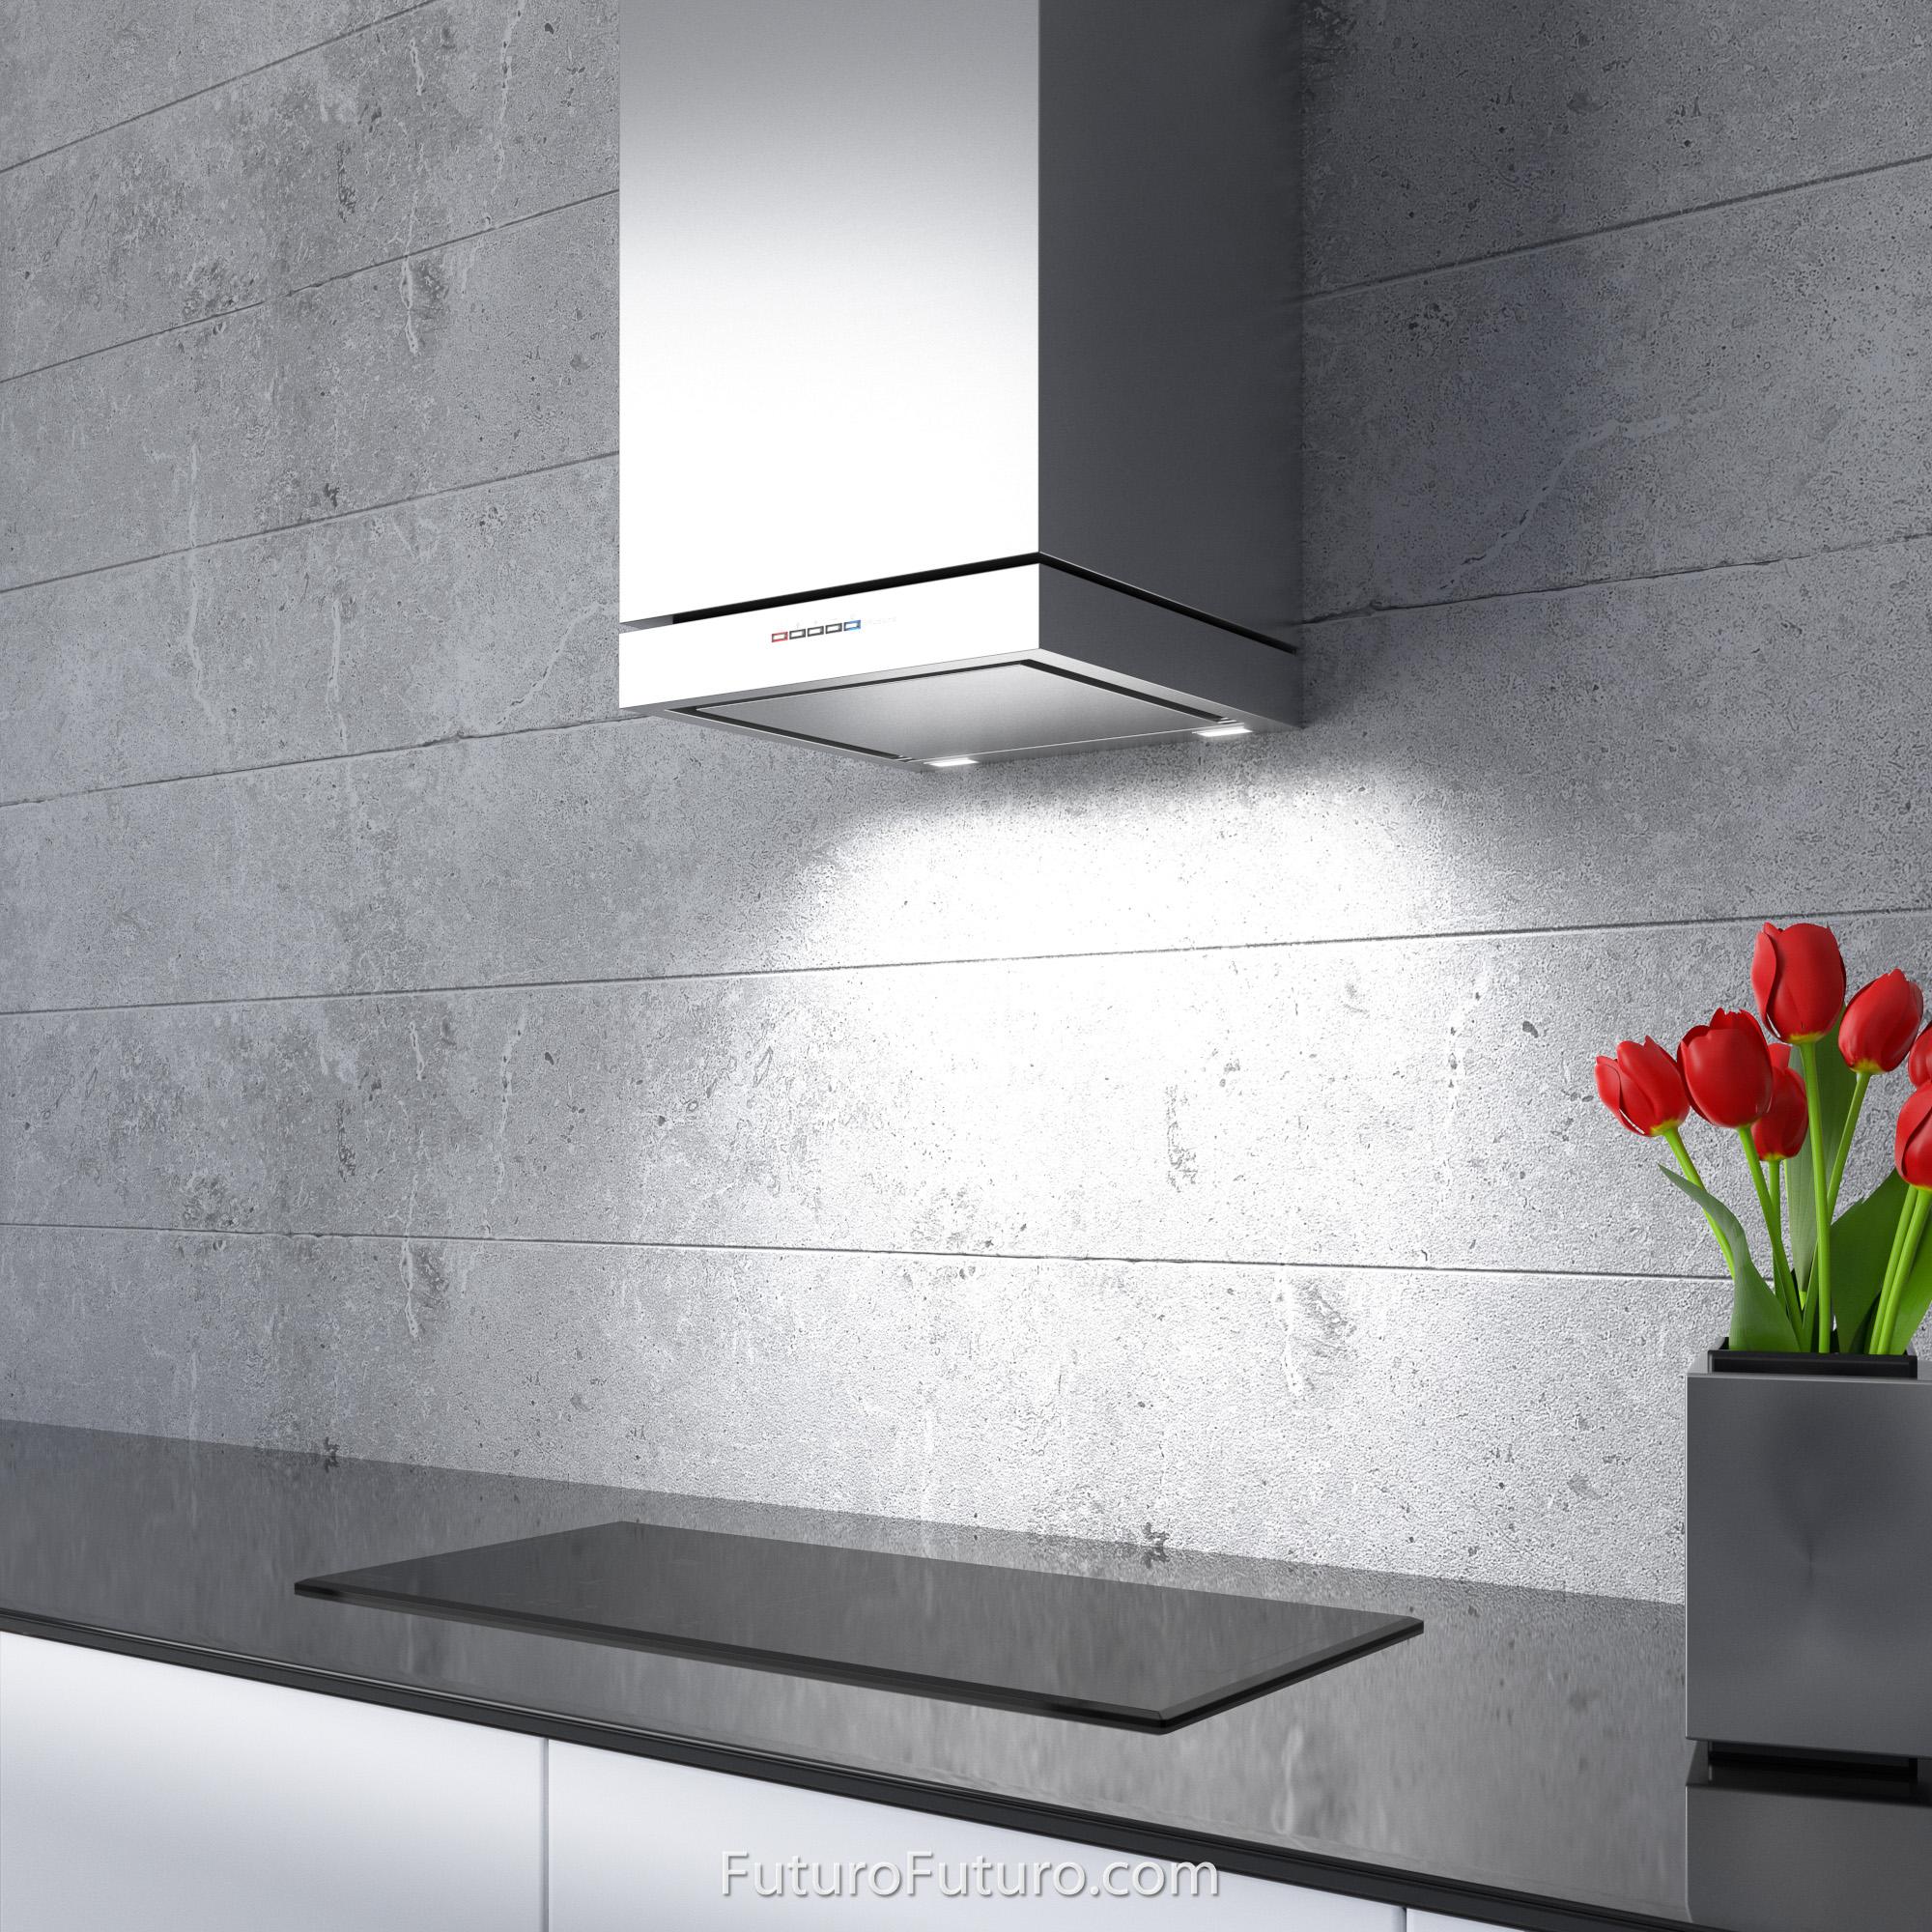 ctm kitchen wall tiles price kitchen